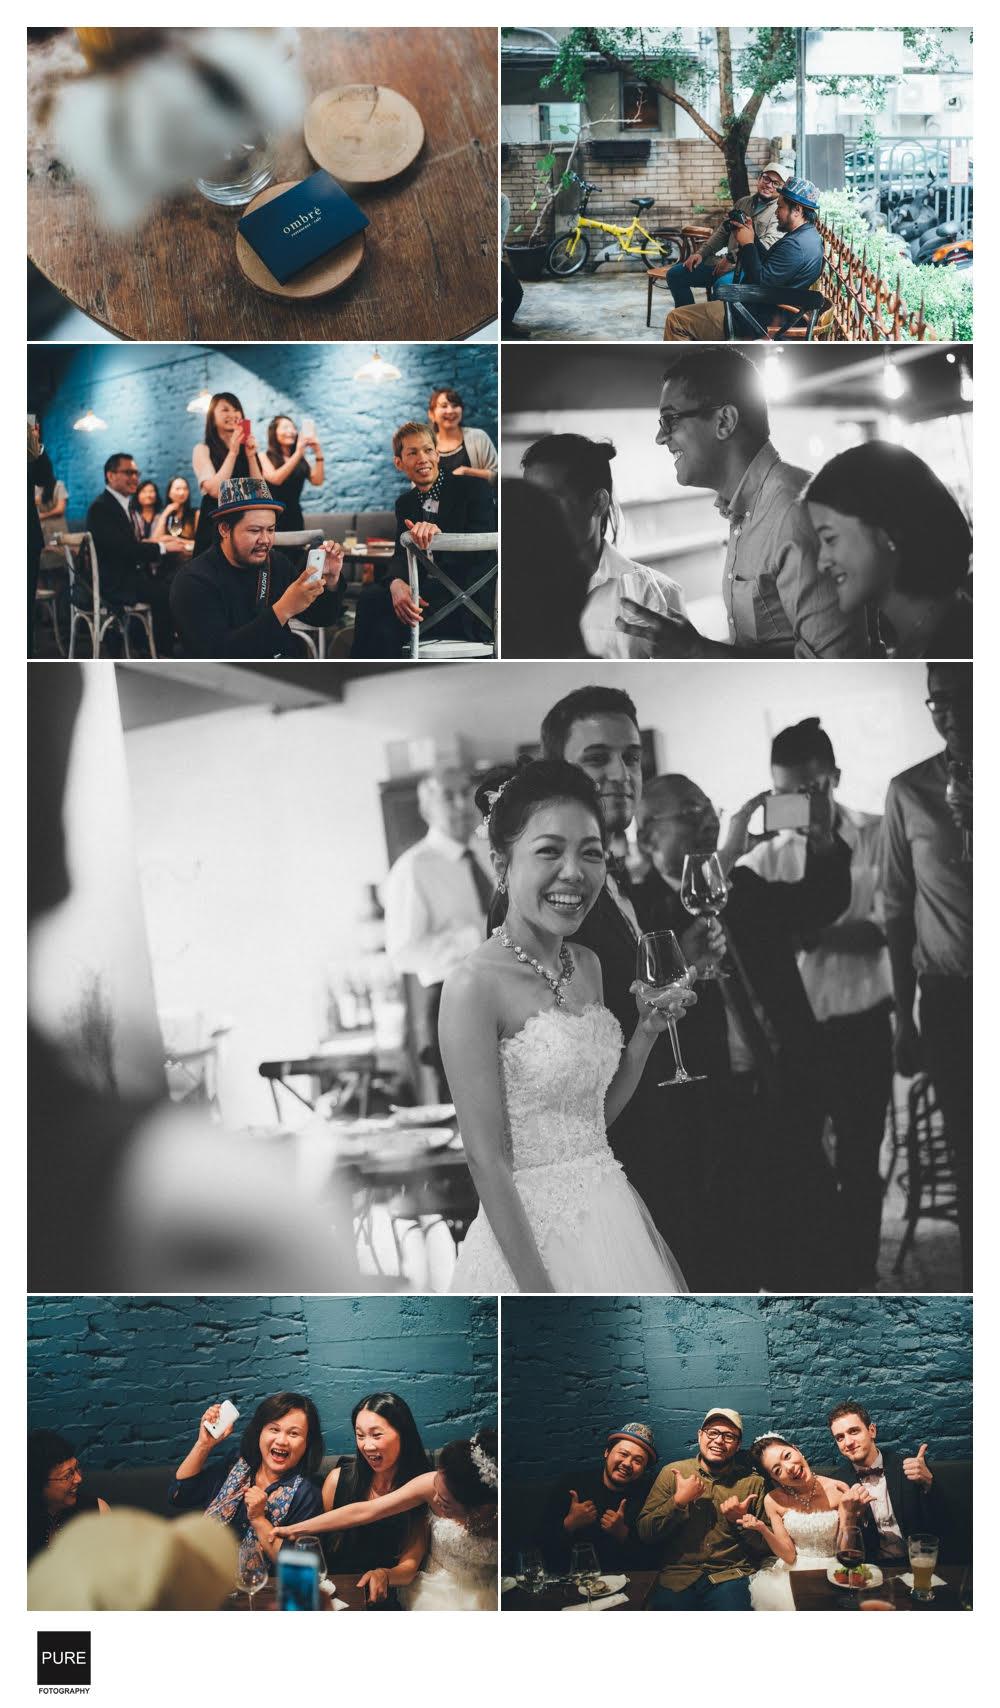 PUREFOTO_台灣婚禮平面攝影wedding_PUREFOTO美式婚禮攝影